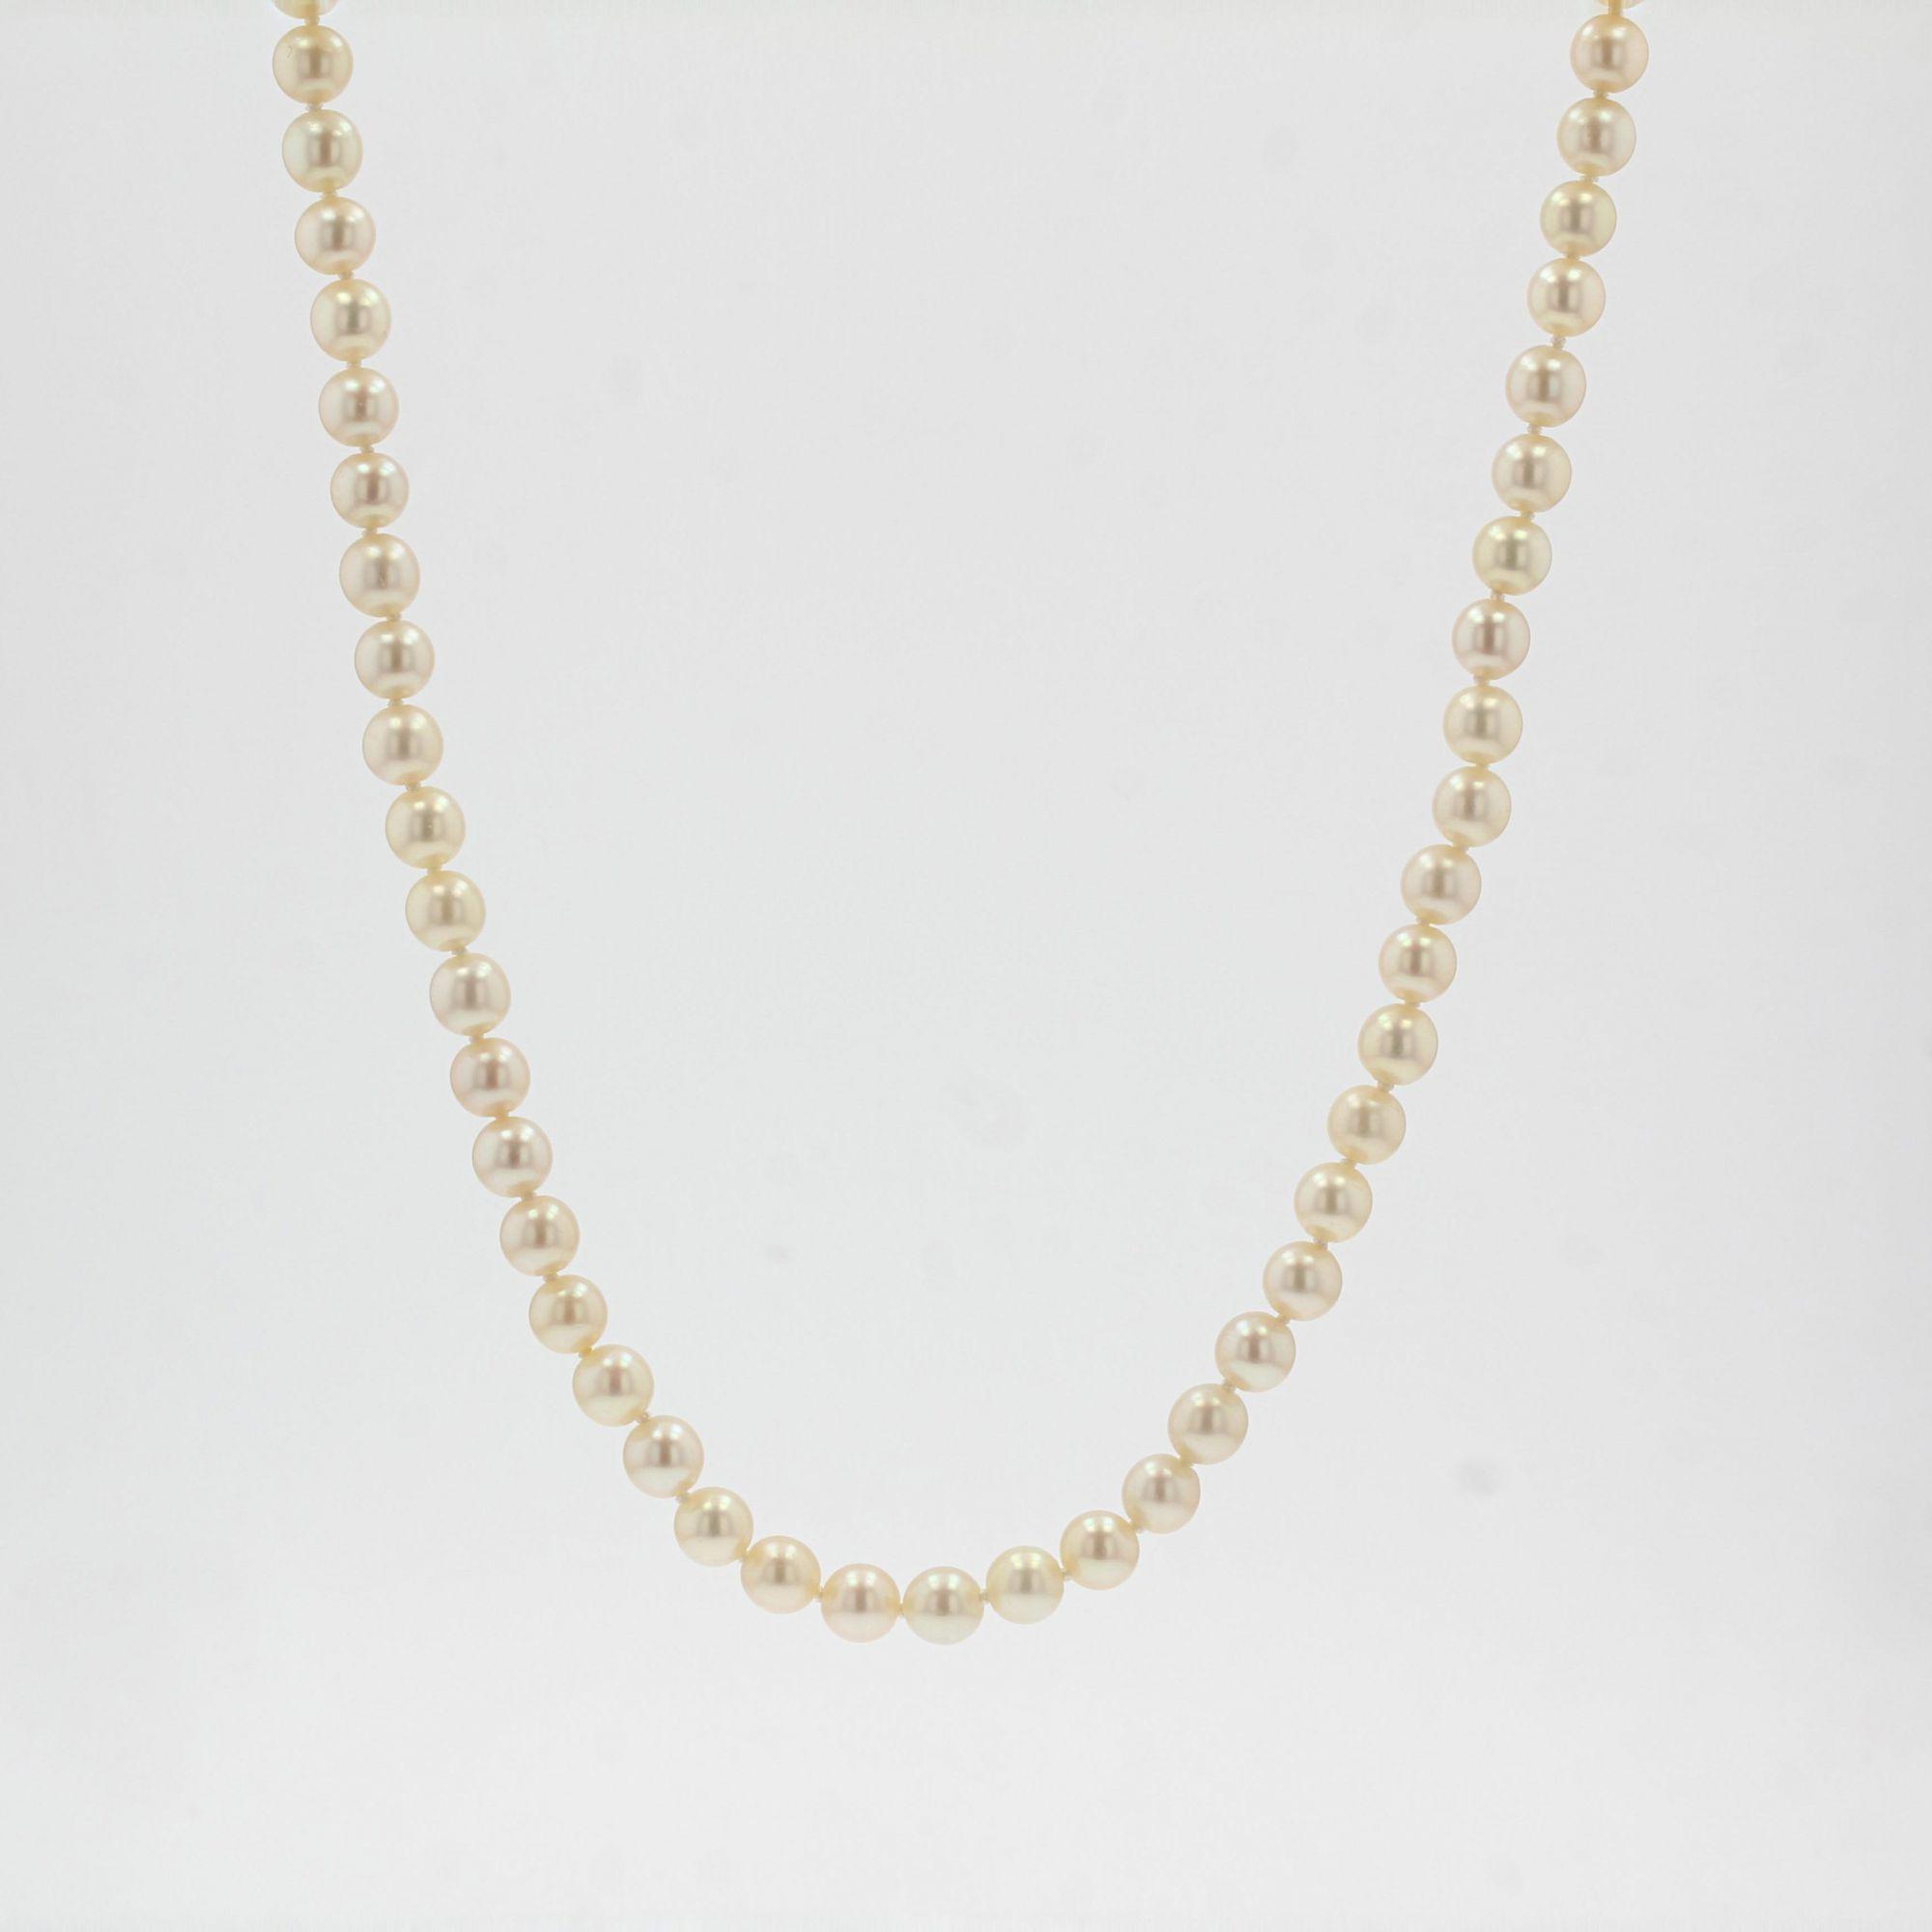 Sautoir de perles de culture Akoya